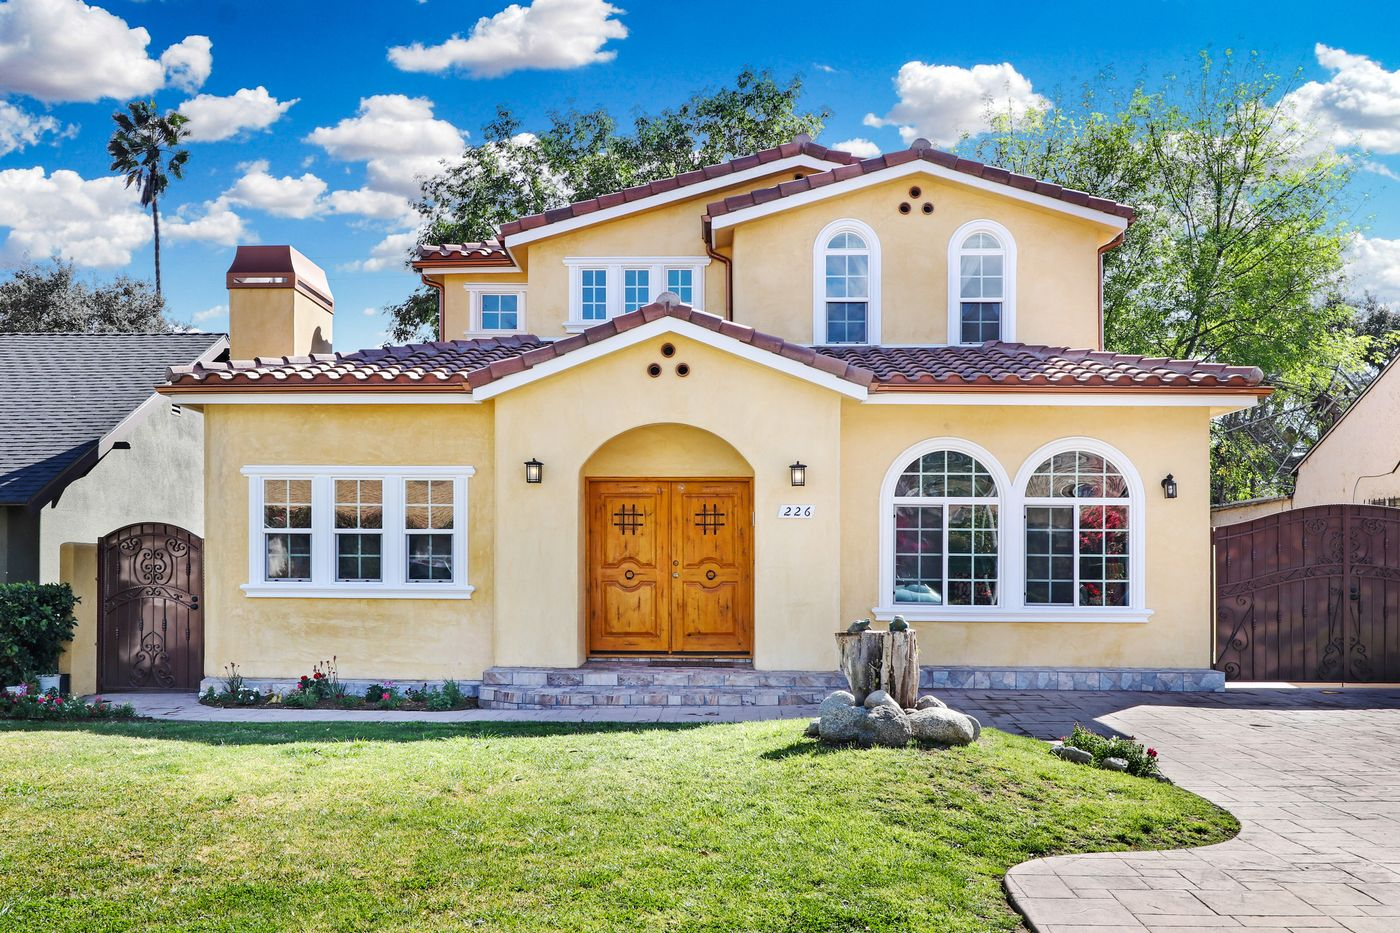 real-estate-photography-los-angeles-pasadena-glendale-burbank-AD-photographer-29